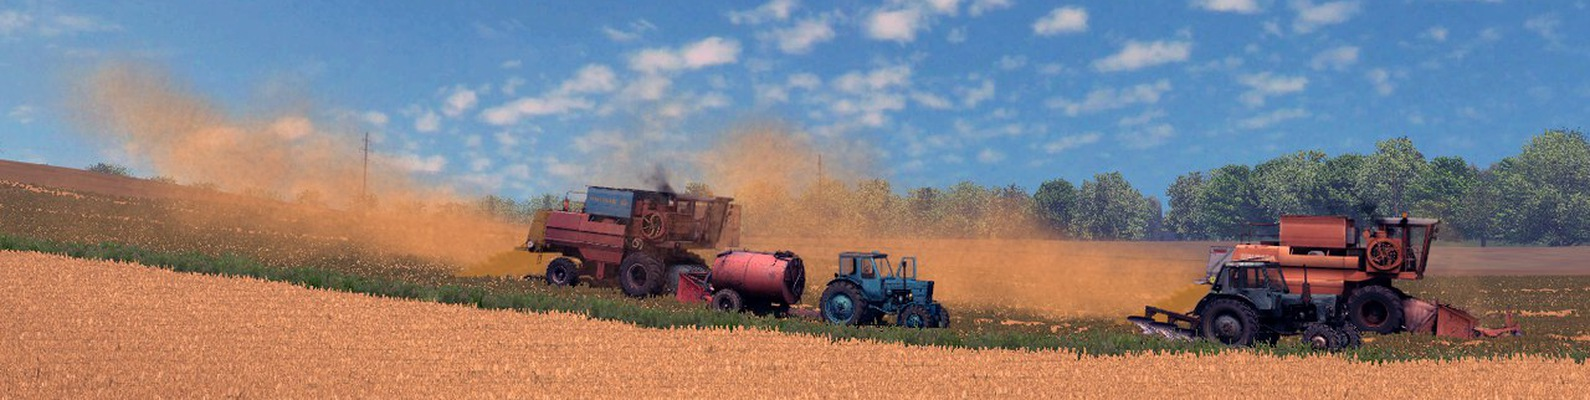 Vk Private Mods Farming Simulator 19